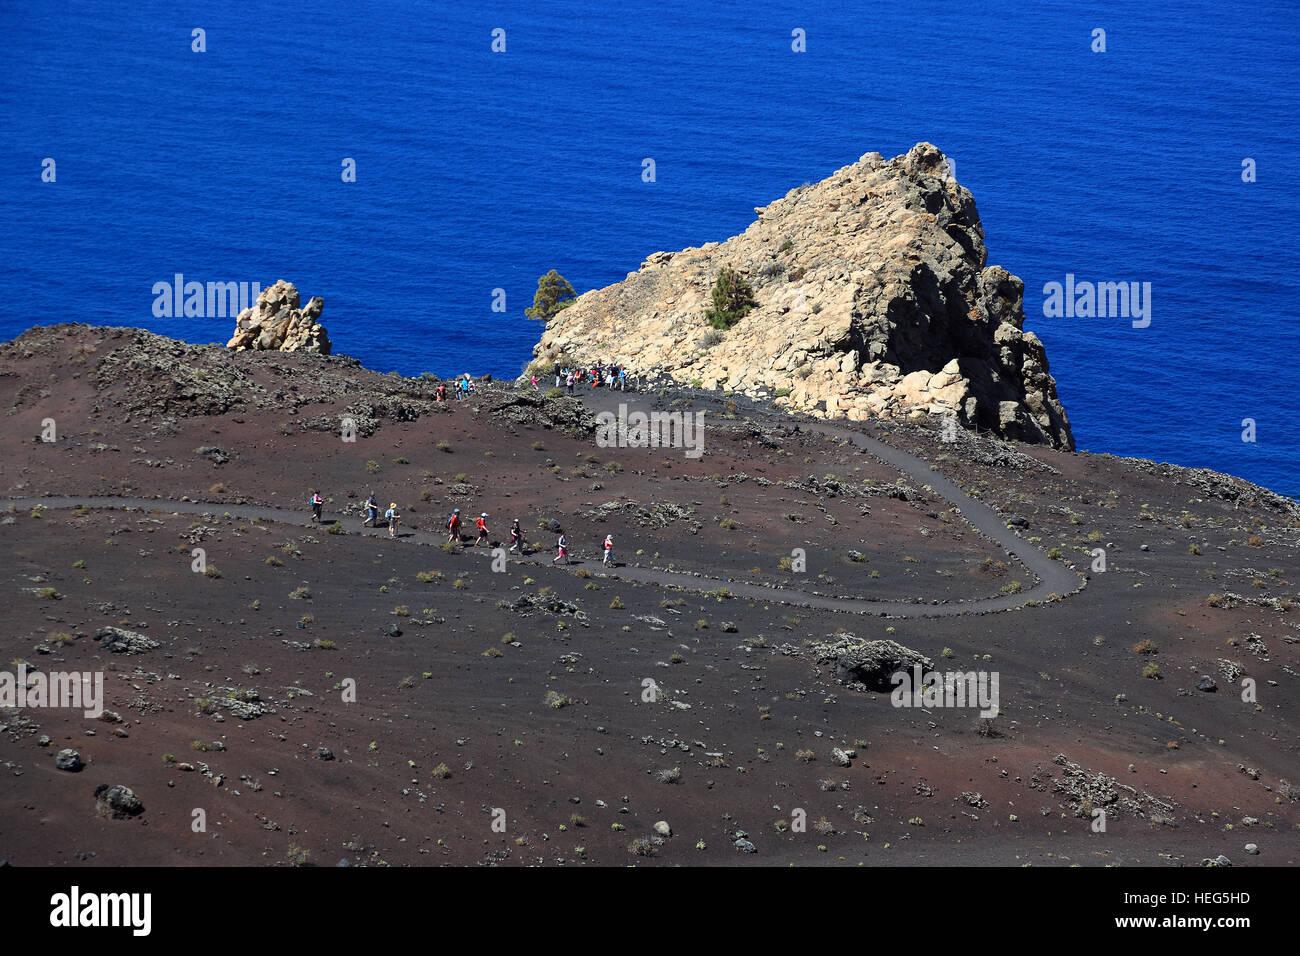 La am Palma, Kanarische Insel, Wanderer Auf Dem Weg Vom Vulkan San Antonio Zum Vulkan Teneguia Cap Fuencaliente Stockbild